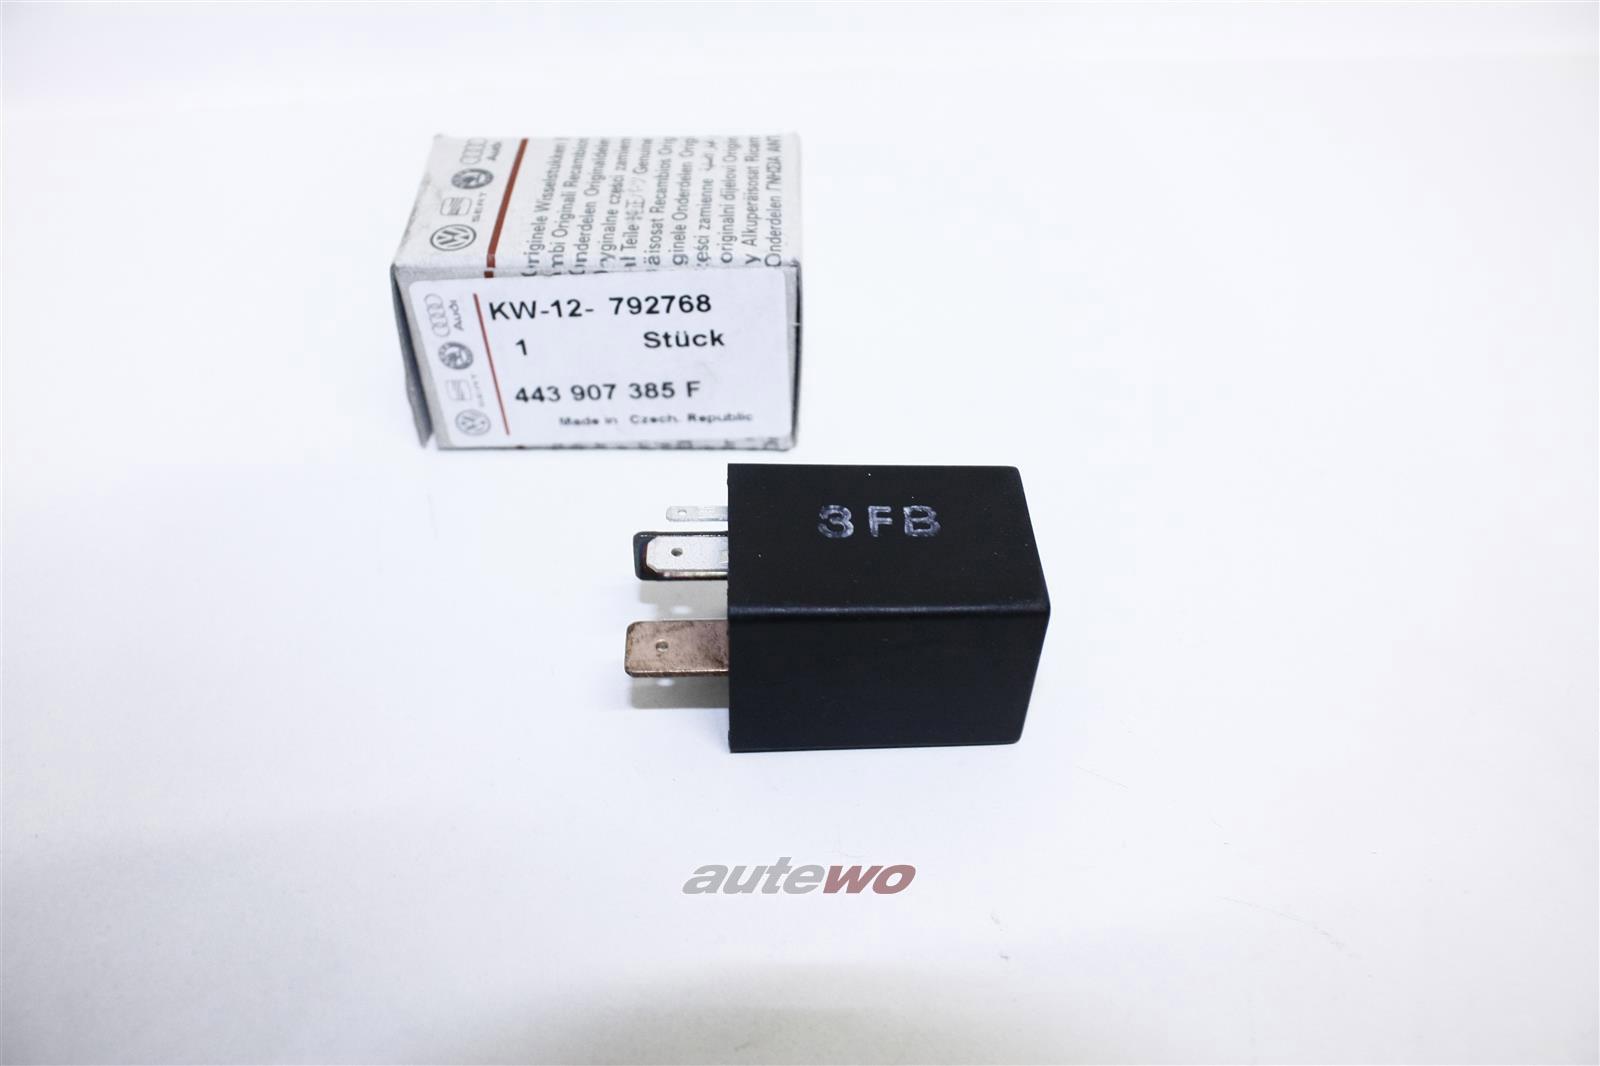 NEU! Audi 90/100 Typ 44 5 Zylinder Kraftstoffpumpenrelais 443907385F